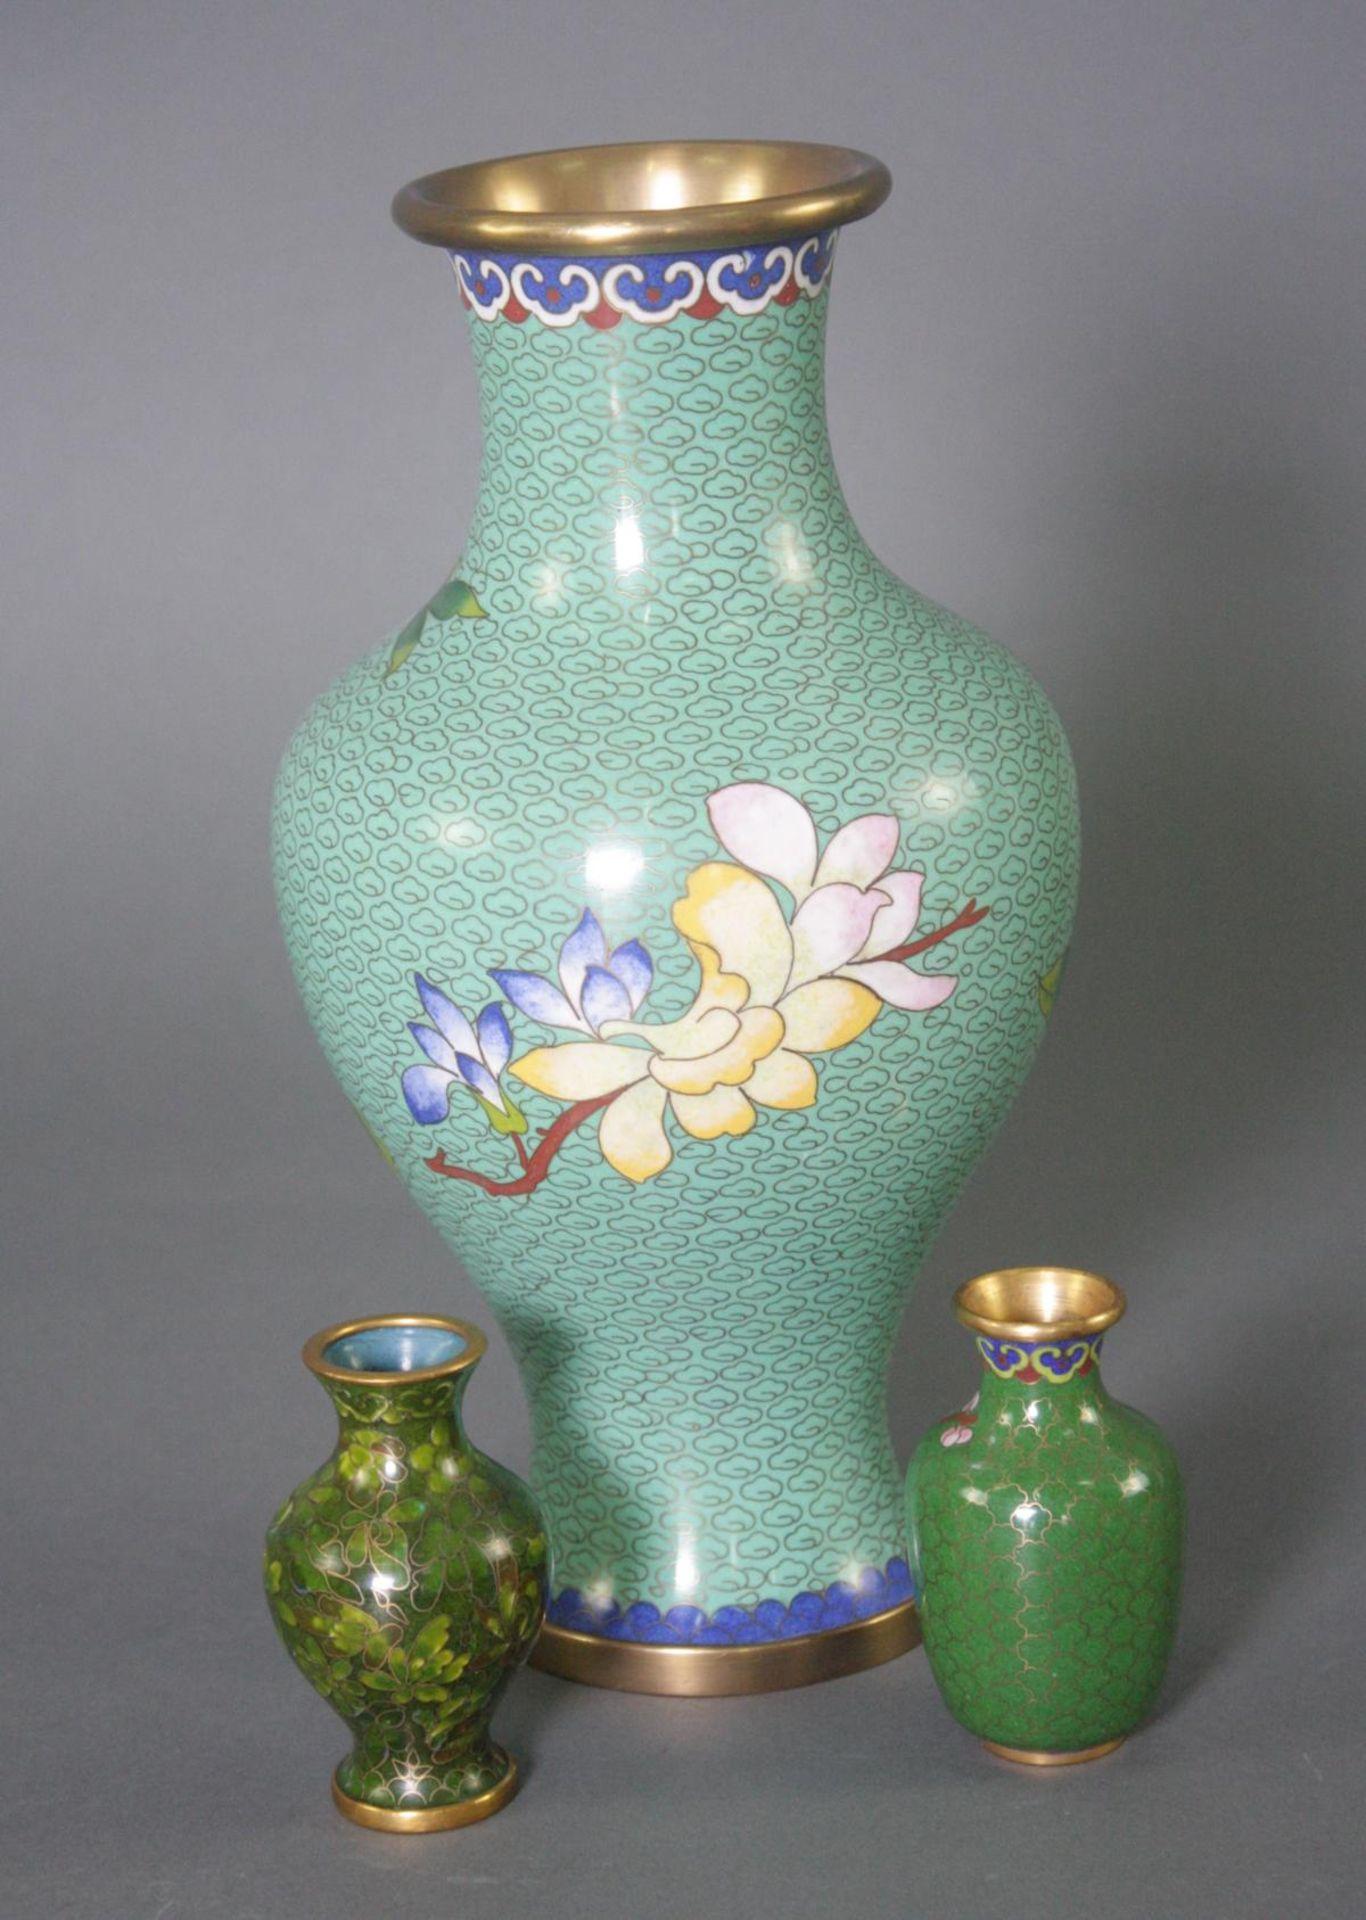 Drei Cloisonné Vasen, China - Bild 3 aus 4